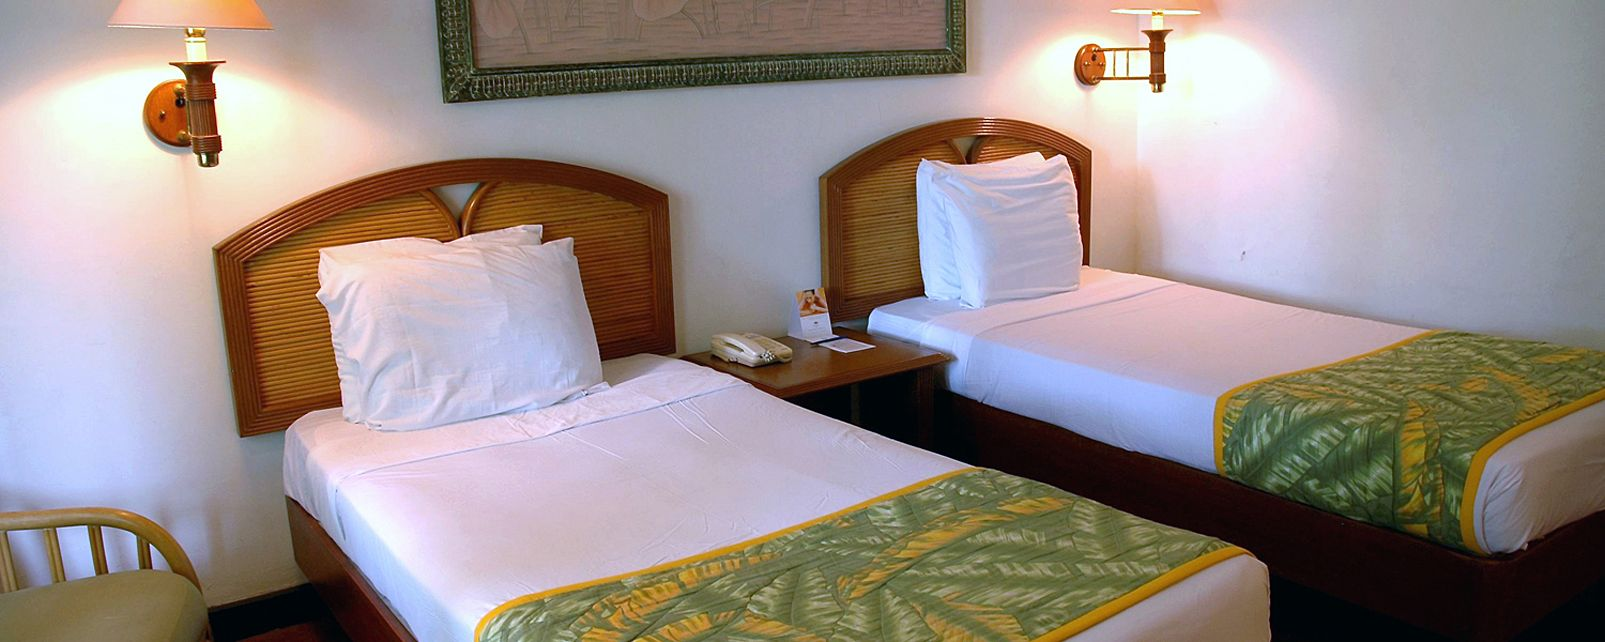 Hotel SENGGIGI REEF DE LUXE